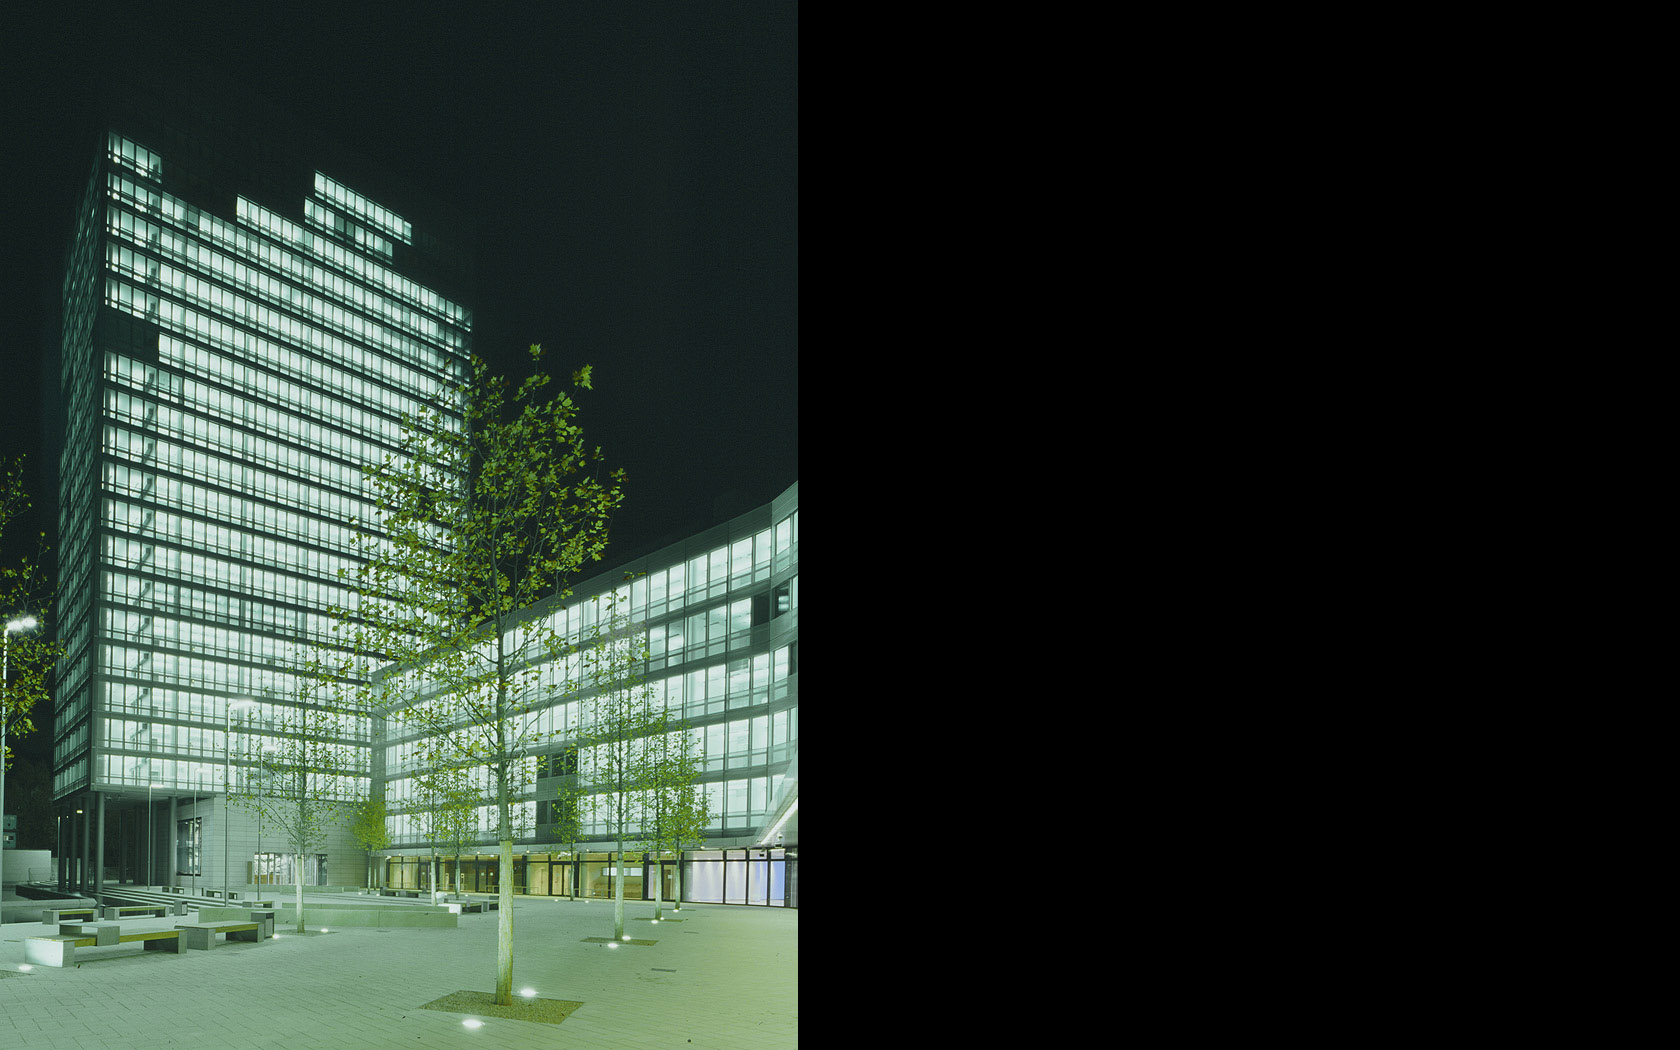 Bürogebäude am Münchner Tor 01